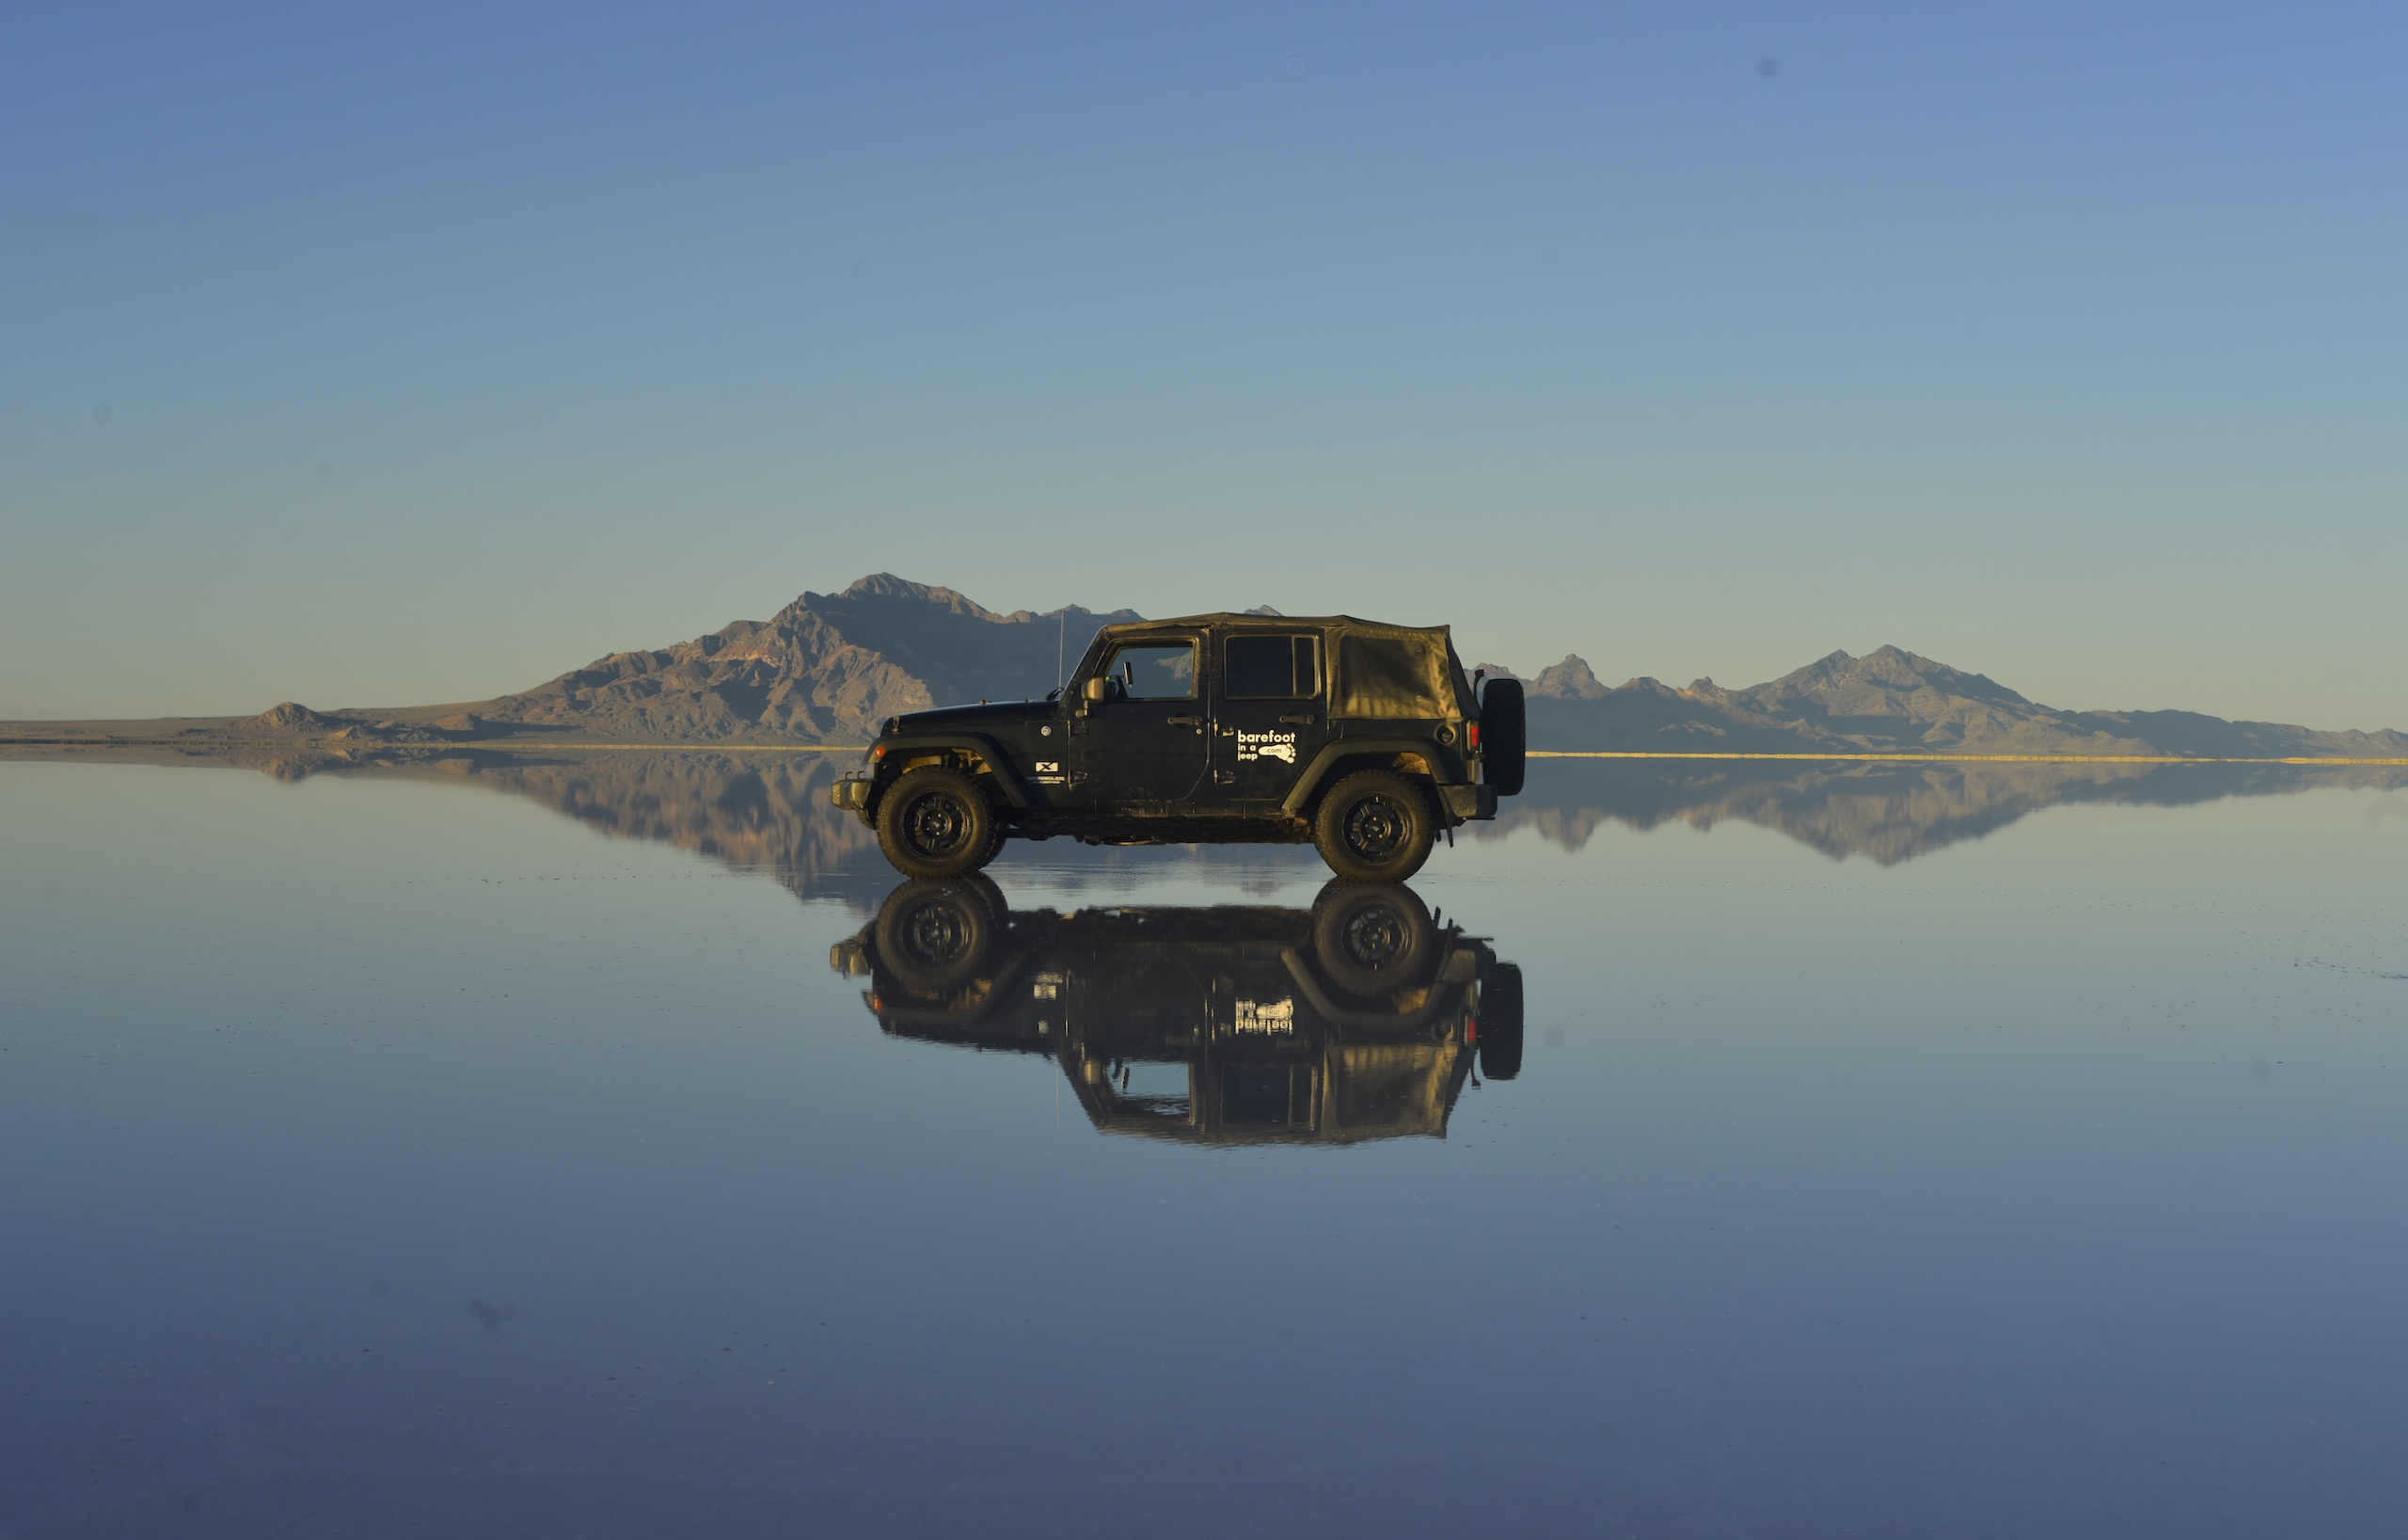 Jeep Wrangler in Nevada, USA, salt flat